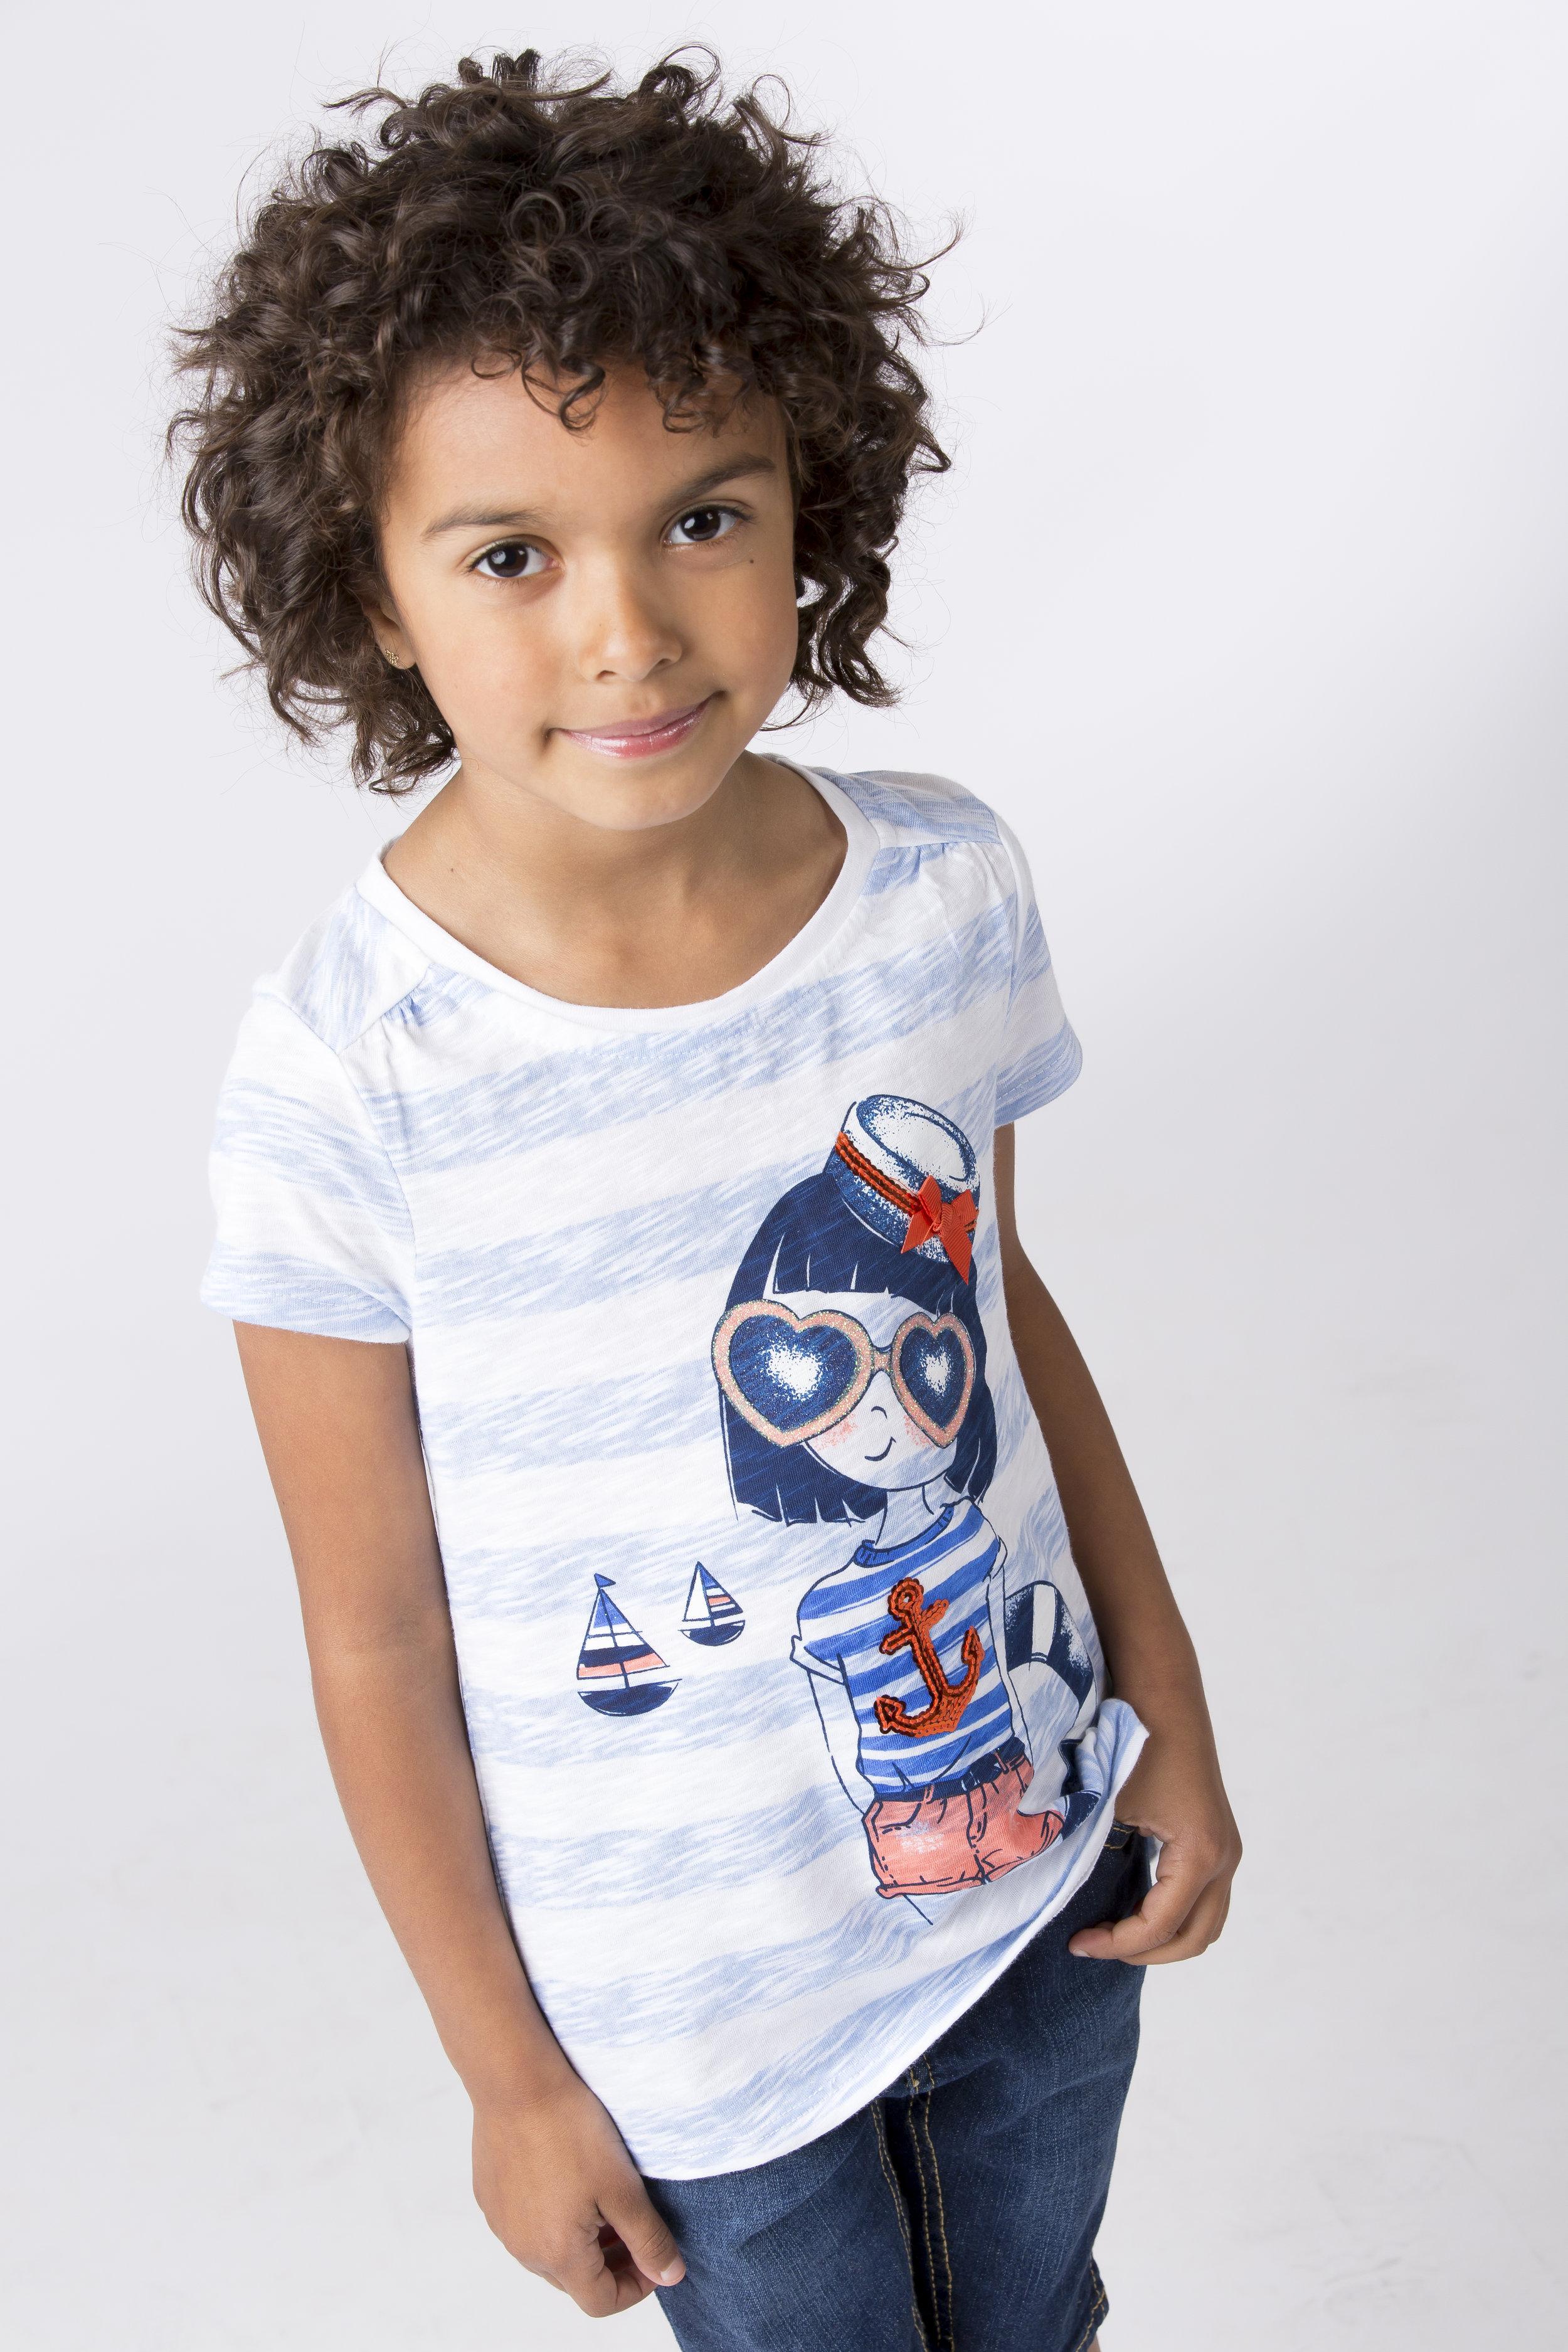 child-modeling-photography-portfolio-portland-or-vancouver-wa-MA4